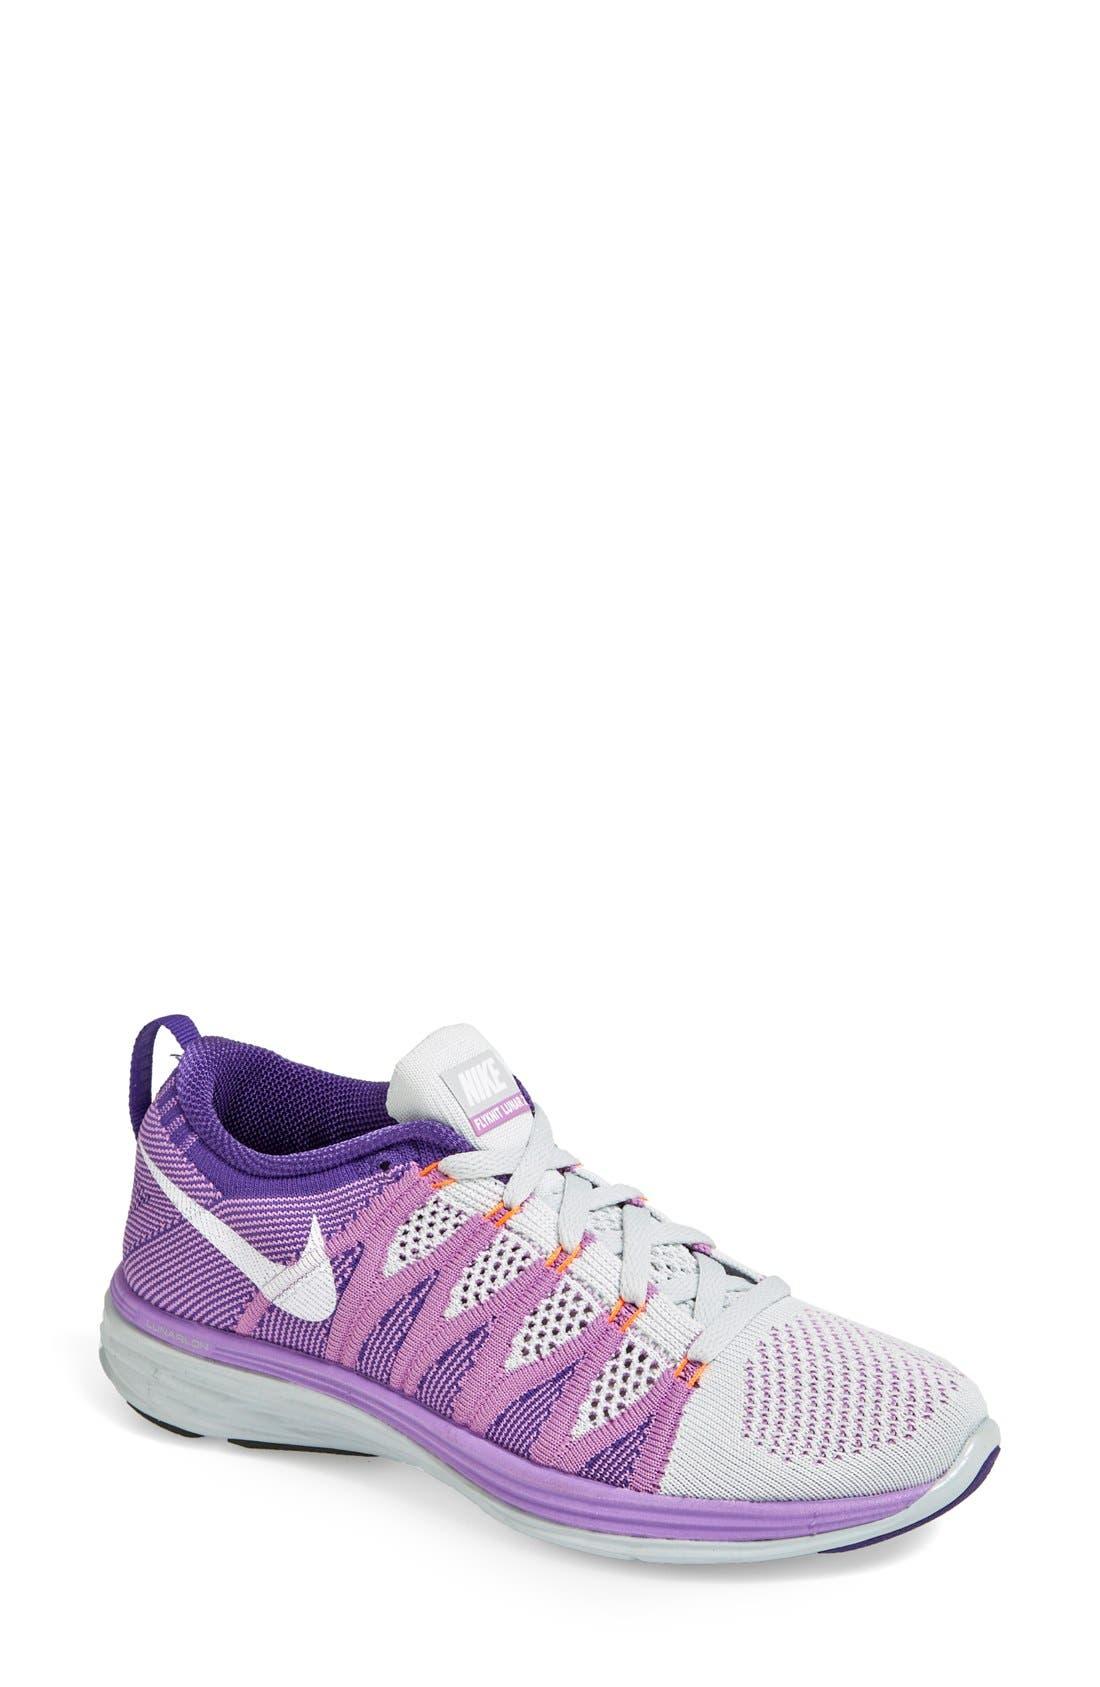 Alternate Image 1 Selected - Nike 'Flyknit Lunar2' Running Shoe (Women)